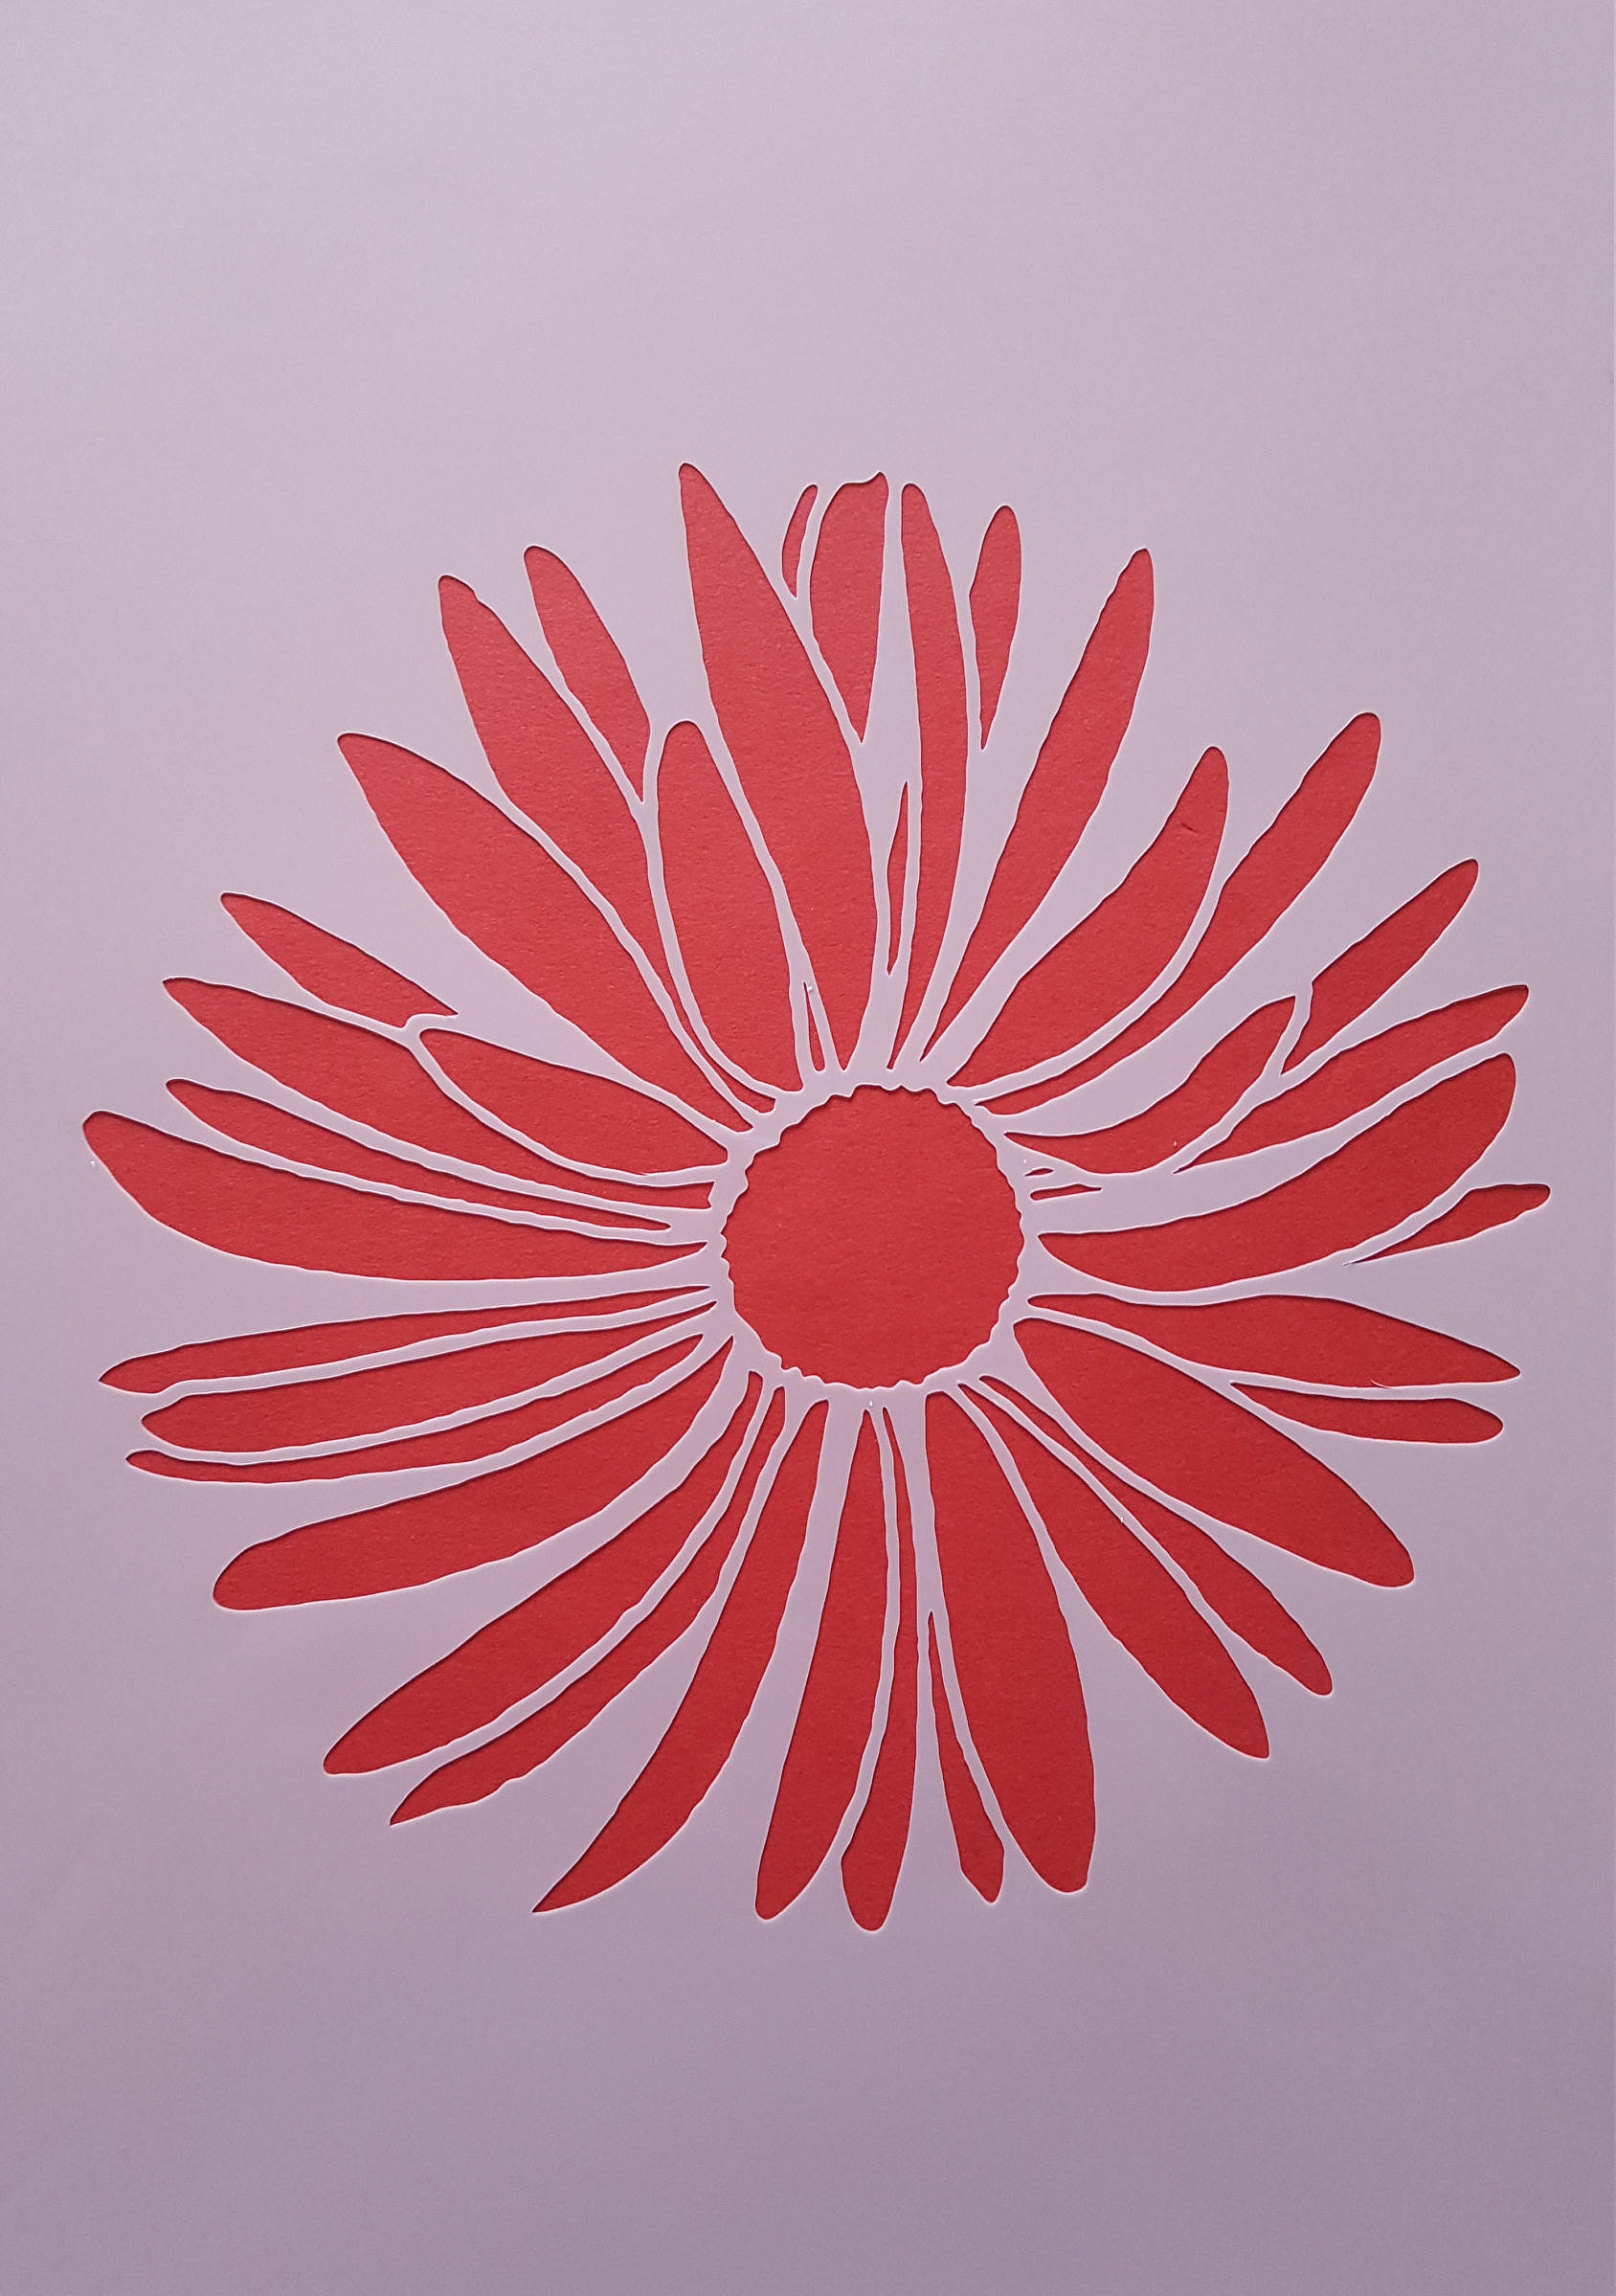 Stencil Flower Wall Decals Airbrush Canvas Fabric Design Etsy